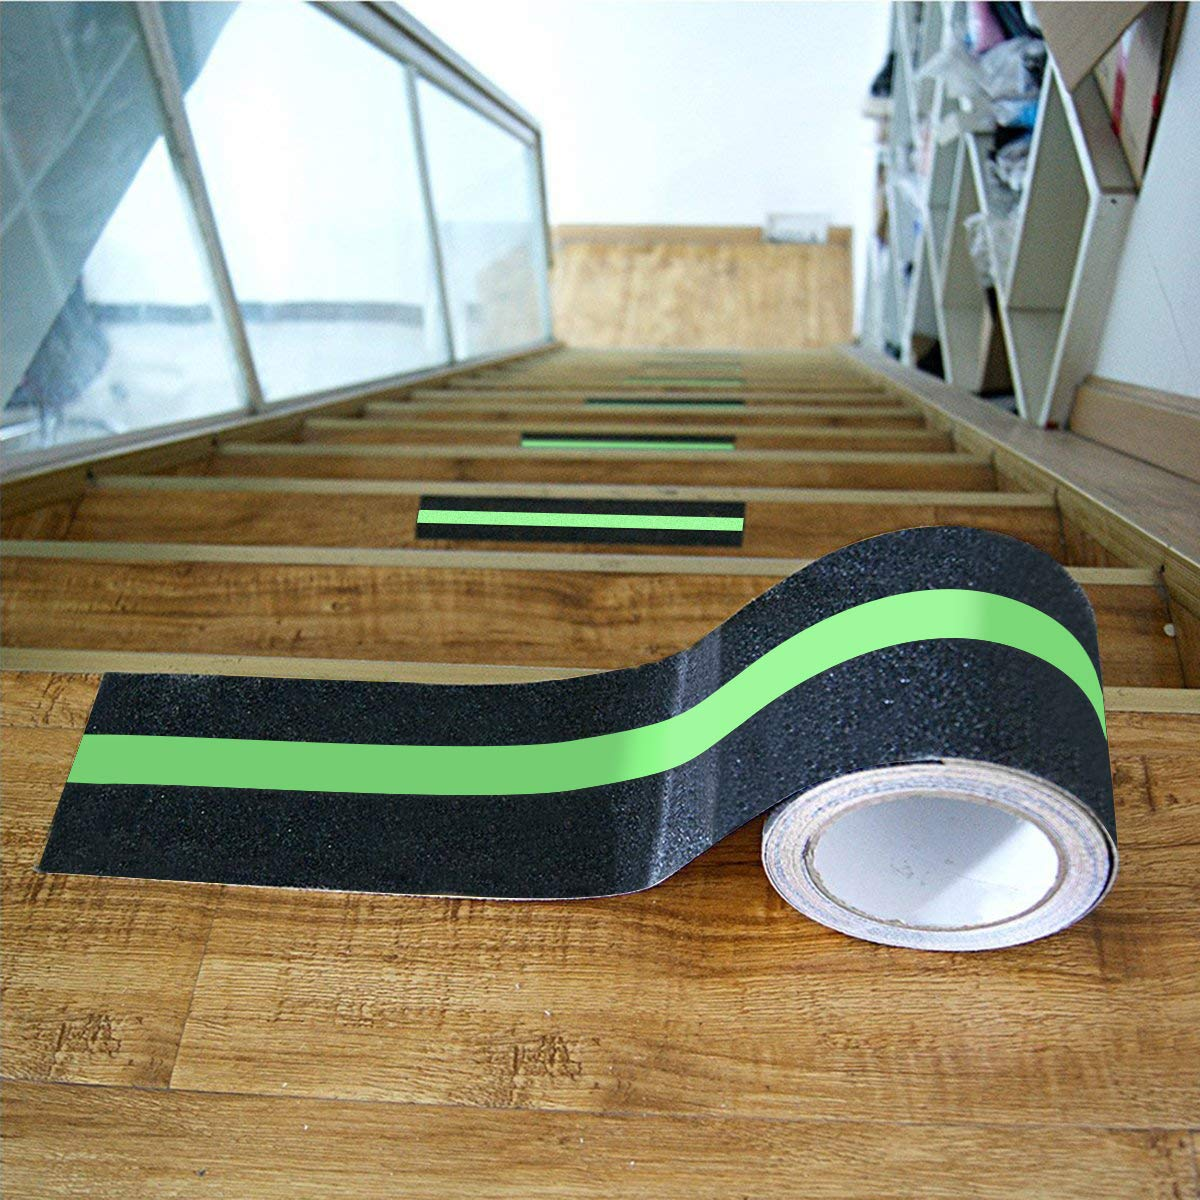 LITTOU  Anti Slip Grip Tape Luminous in Dark Abrasive Sticker Stairs Tread Step Safety Tape Non Slip Stickers 5 cm PVC